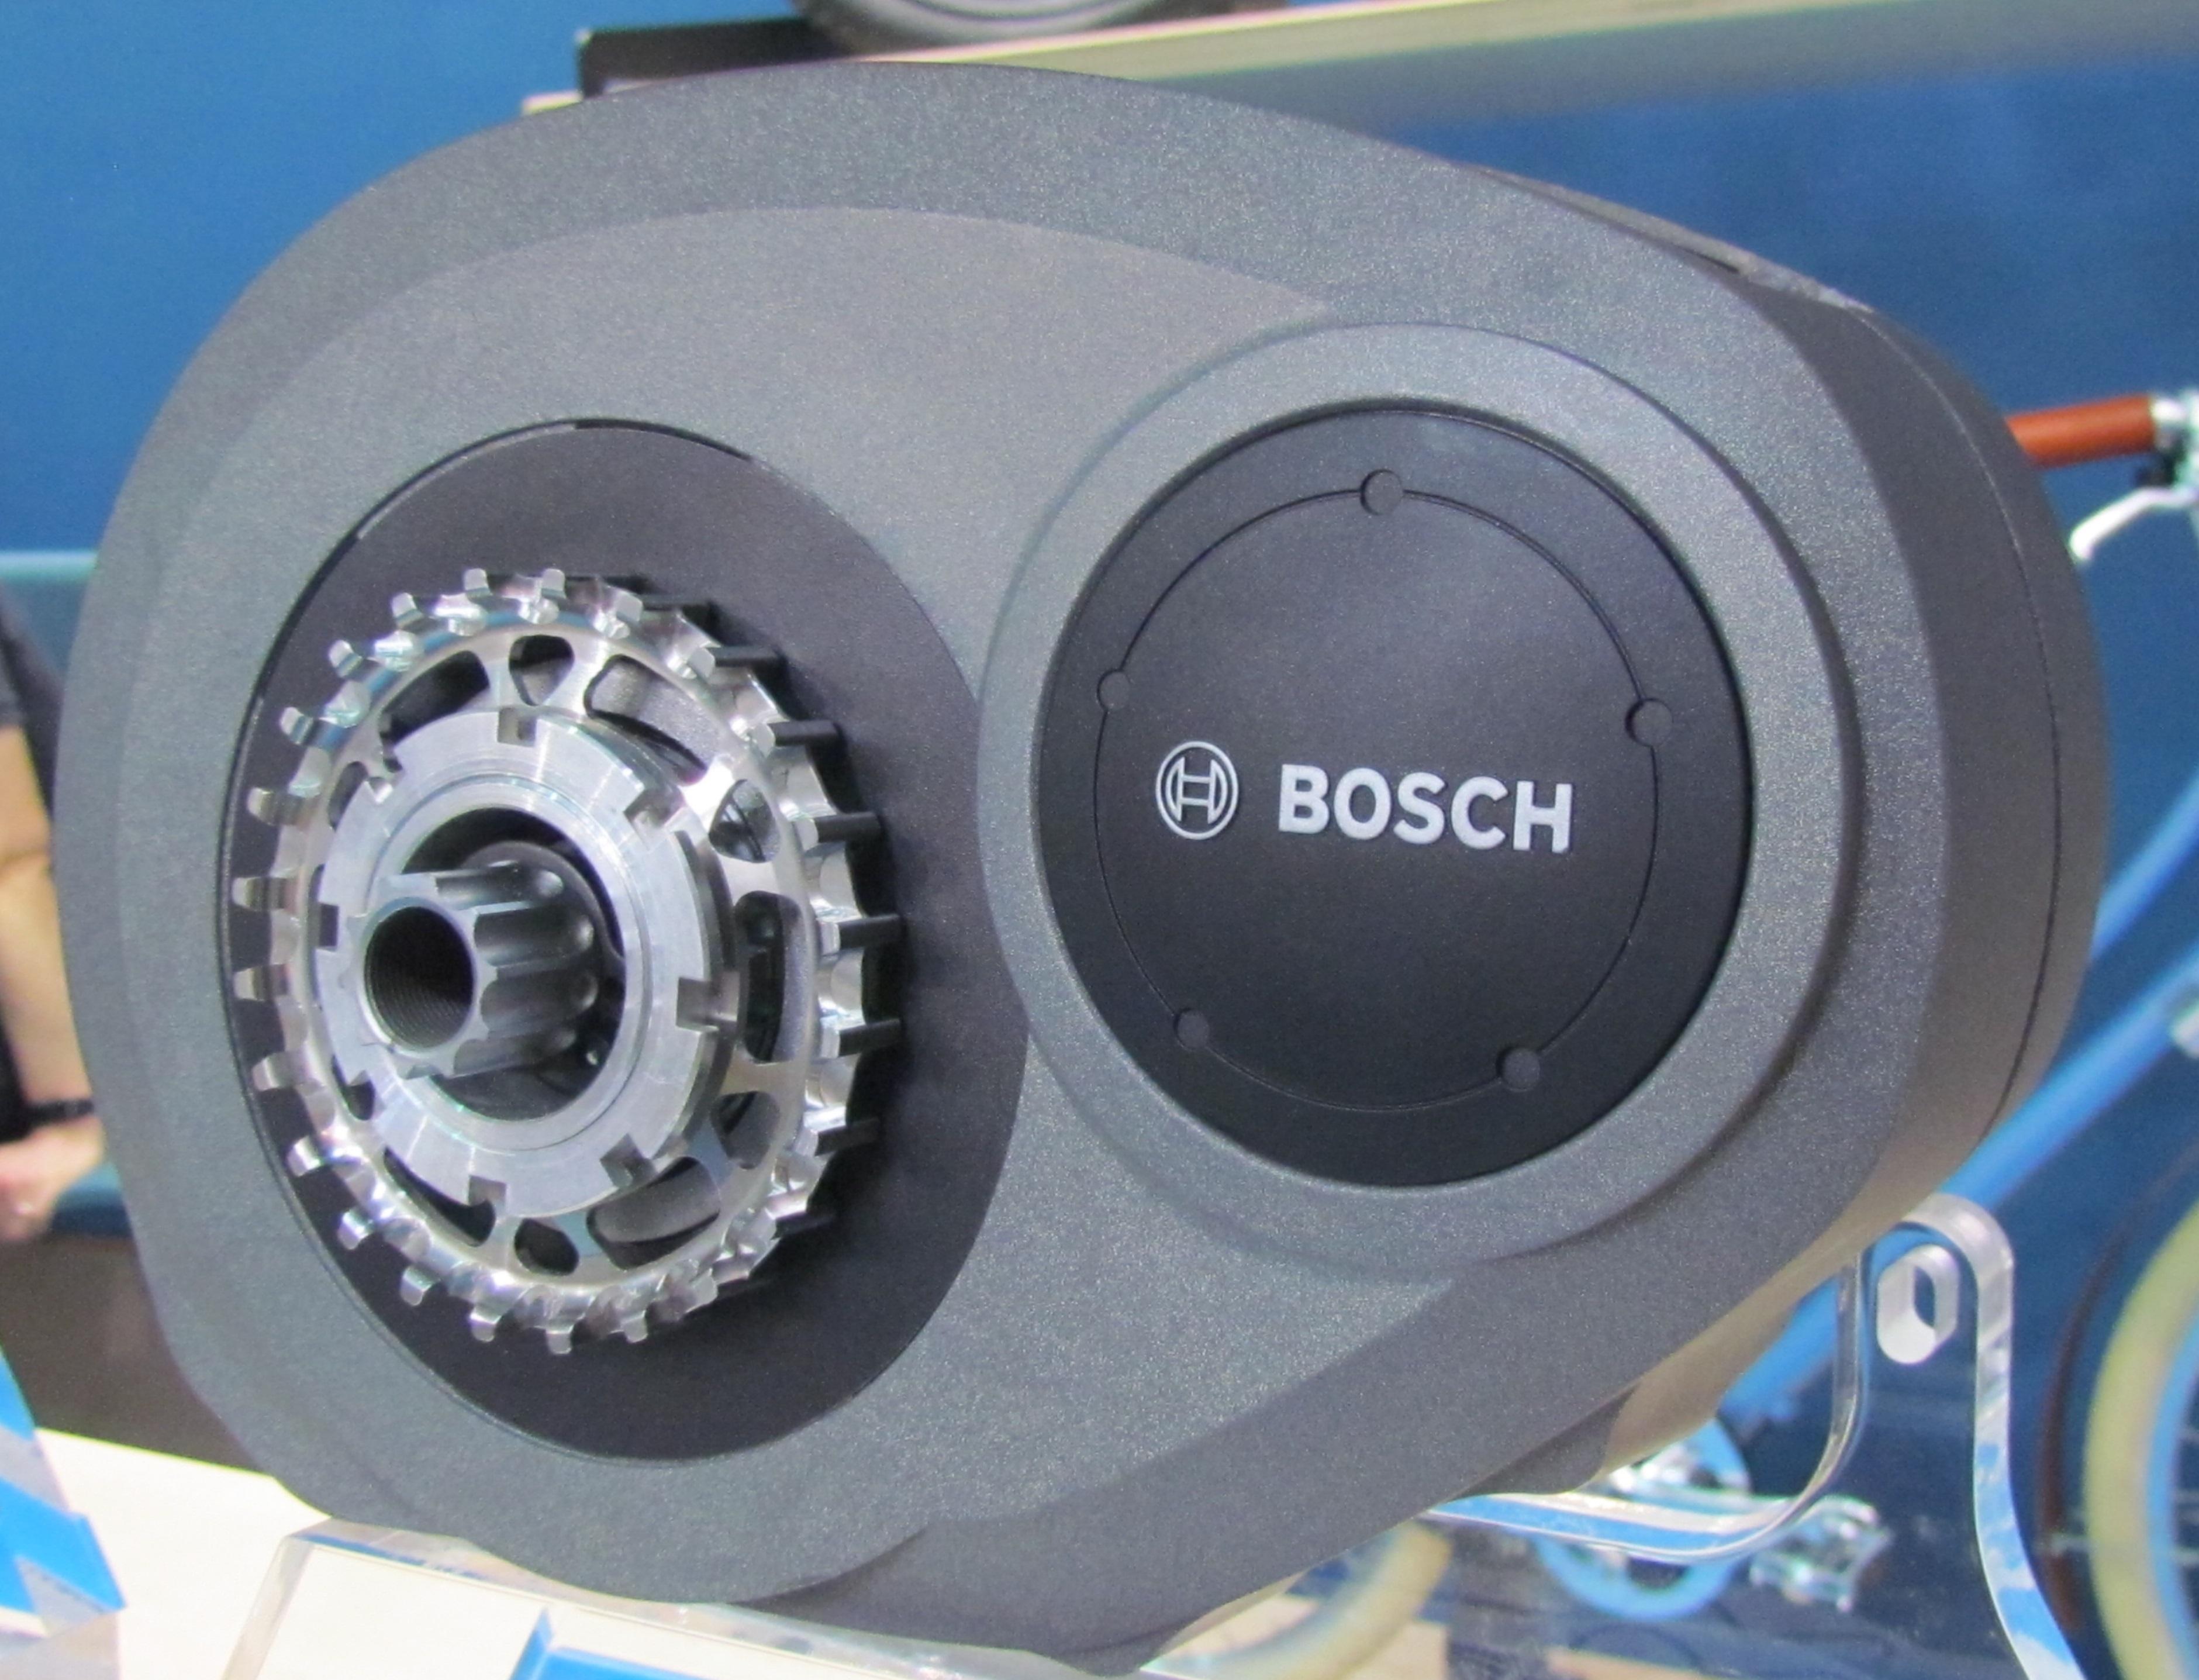 bosch brings mid motor for lower price segments bike europe. Black Bedroom Furniture Sets. Home Design Ideas